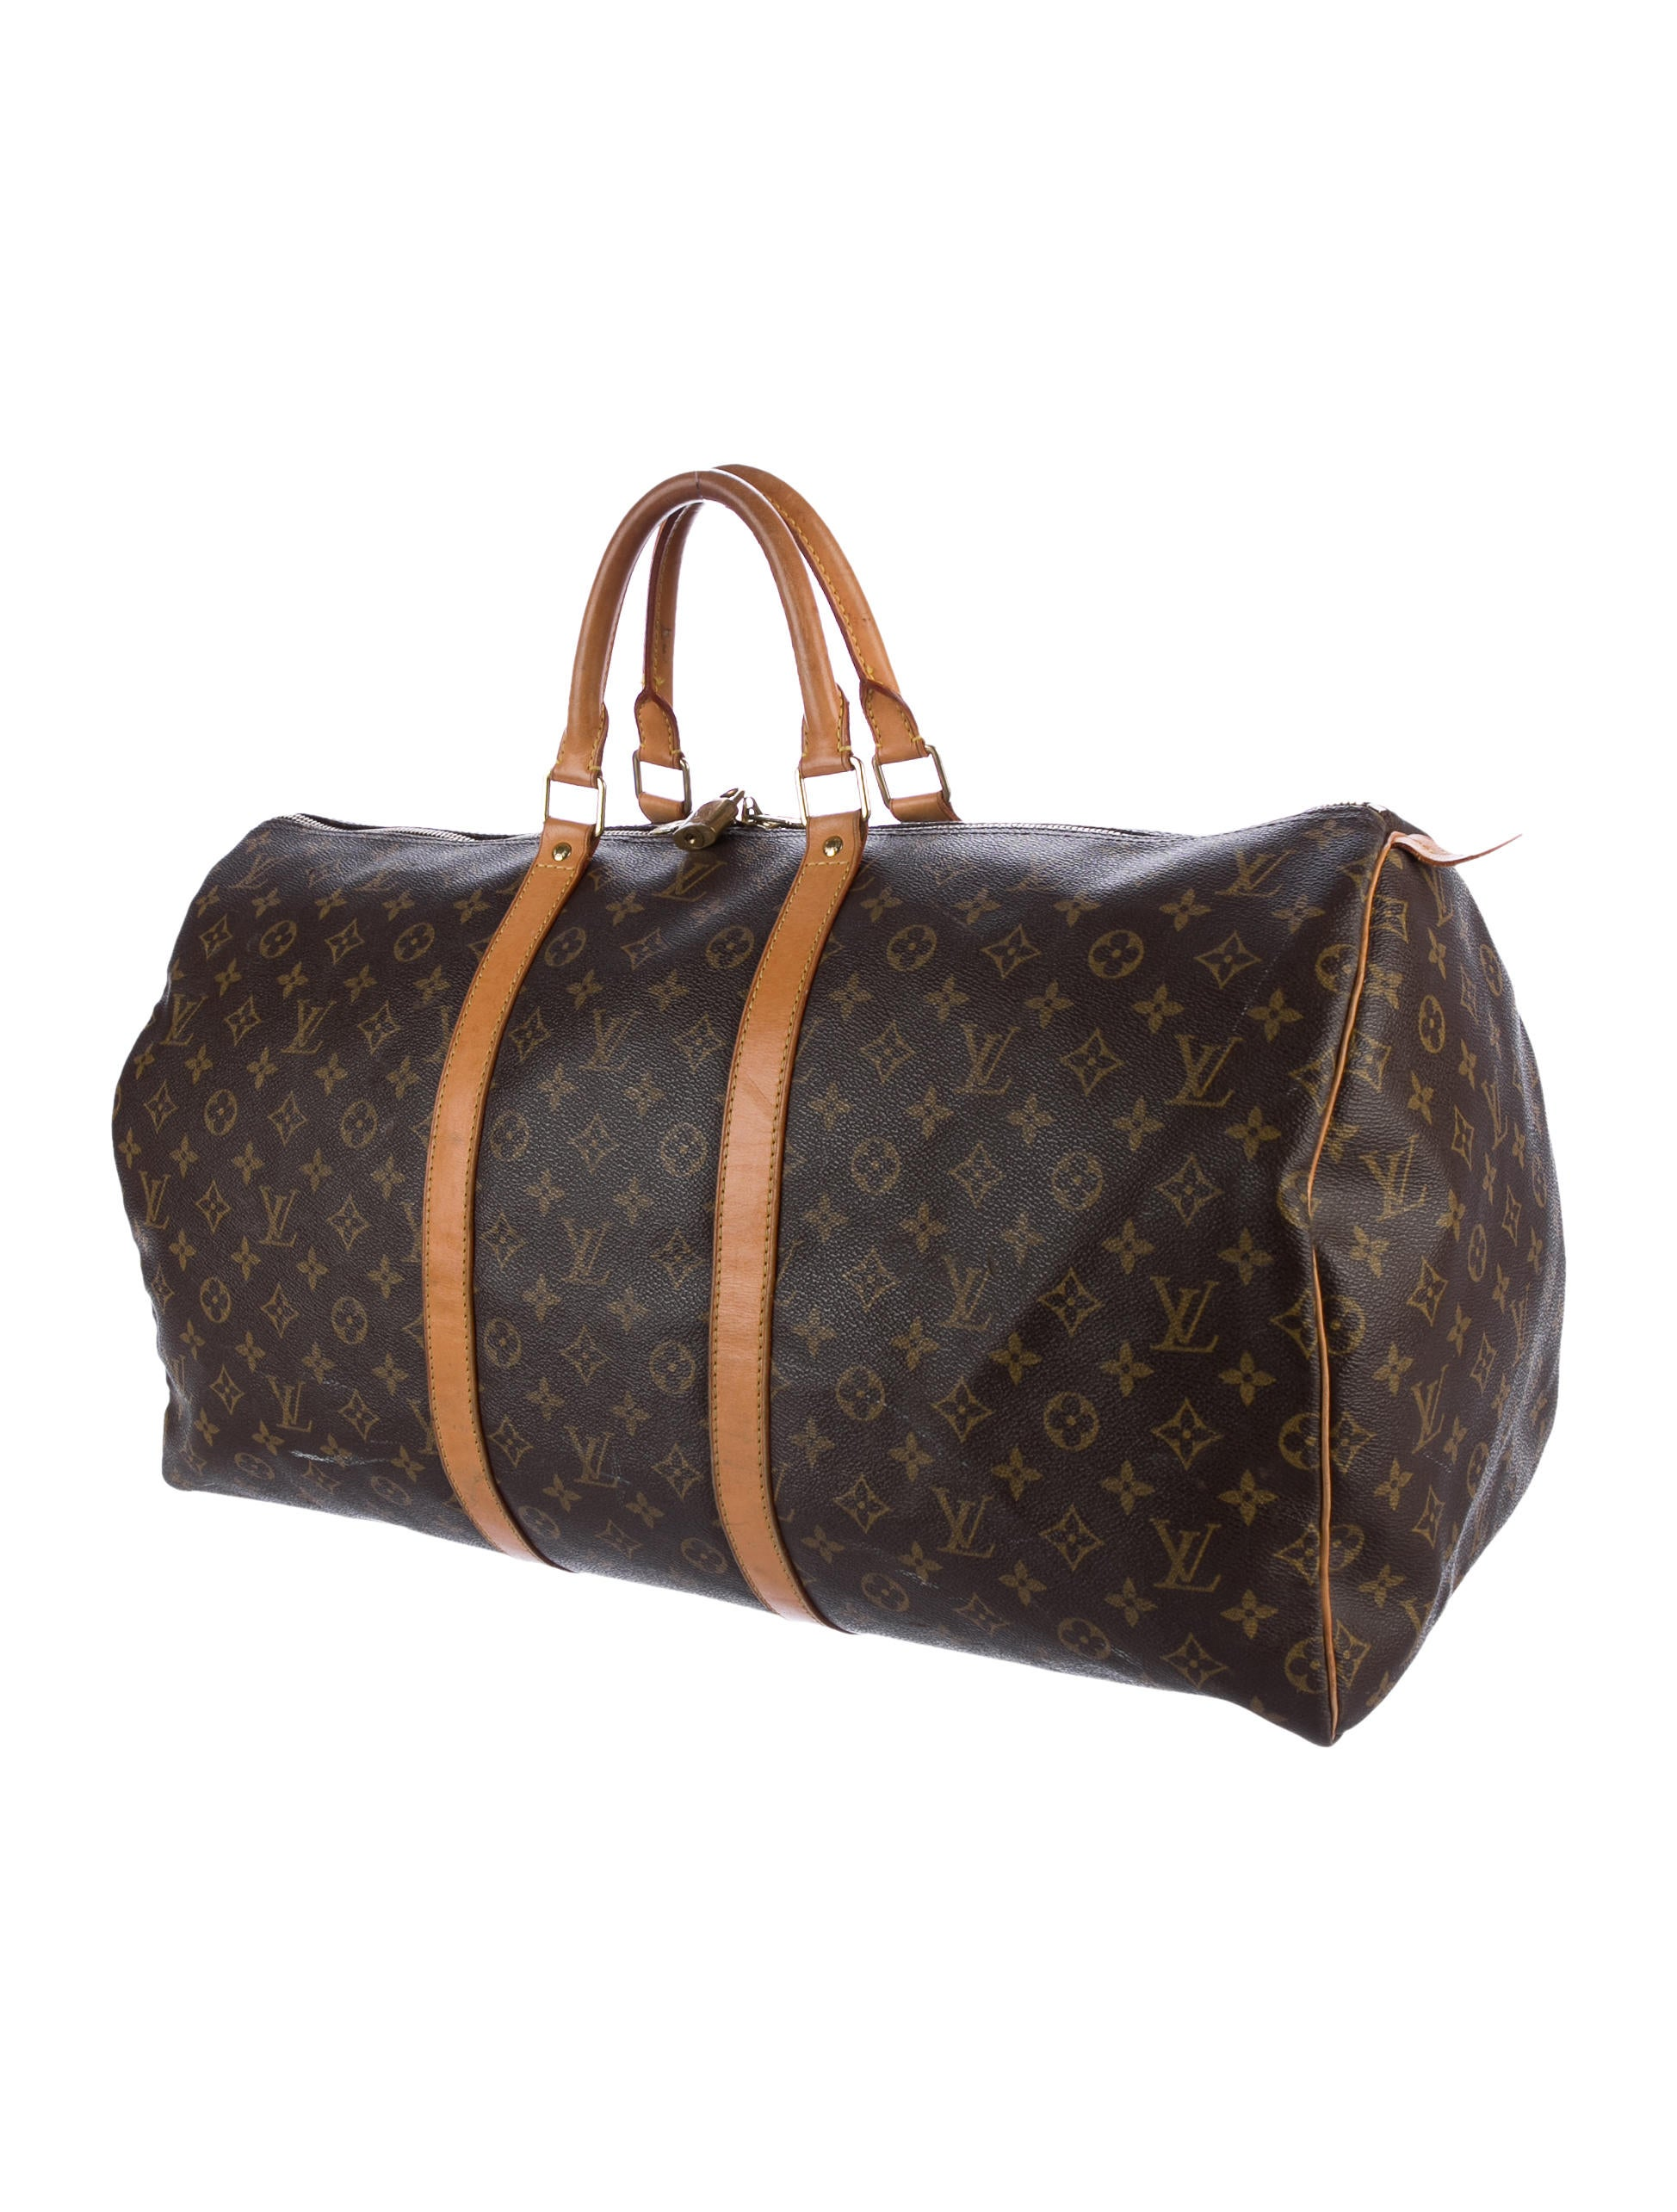 louis vuitton monogram keepall 55 bags lou126174 the realreal. Black Bedroom Furniture Sets. Home Design Ideas